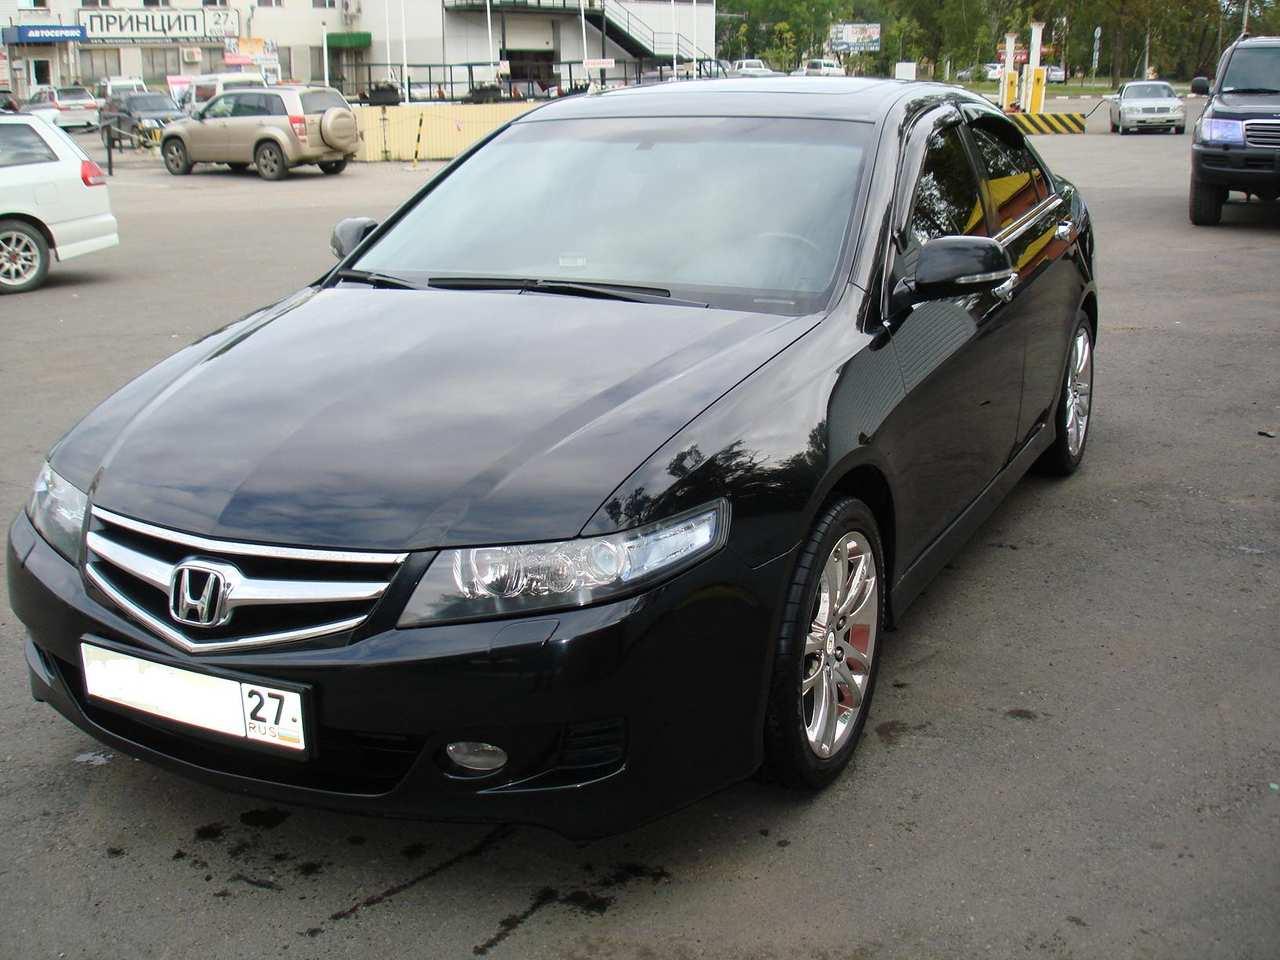 2007 Honda Accord s 2 4 Gasoline FF Automatic For